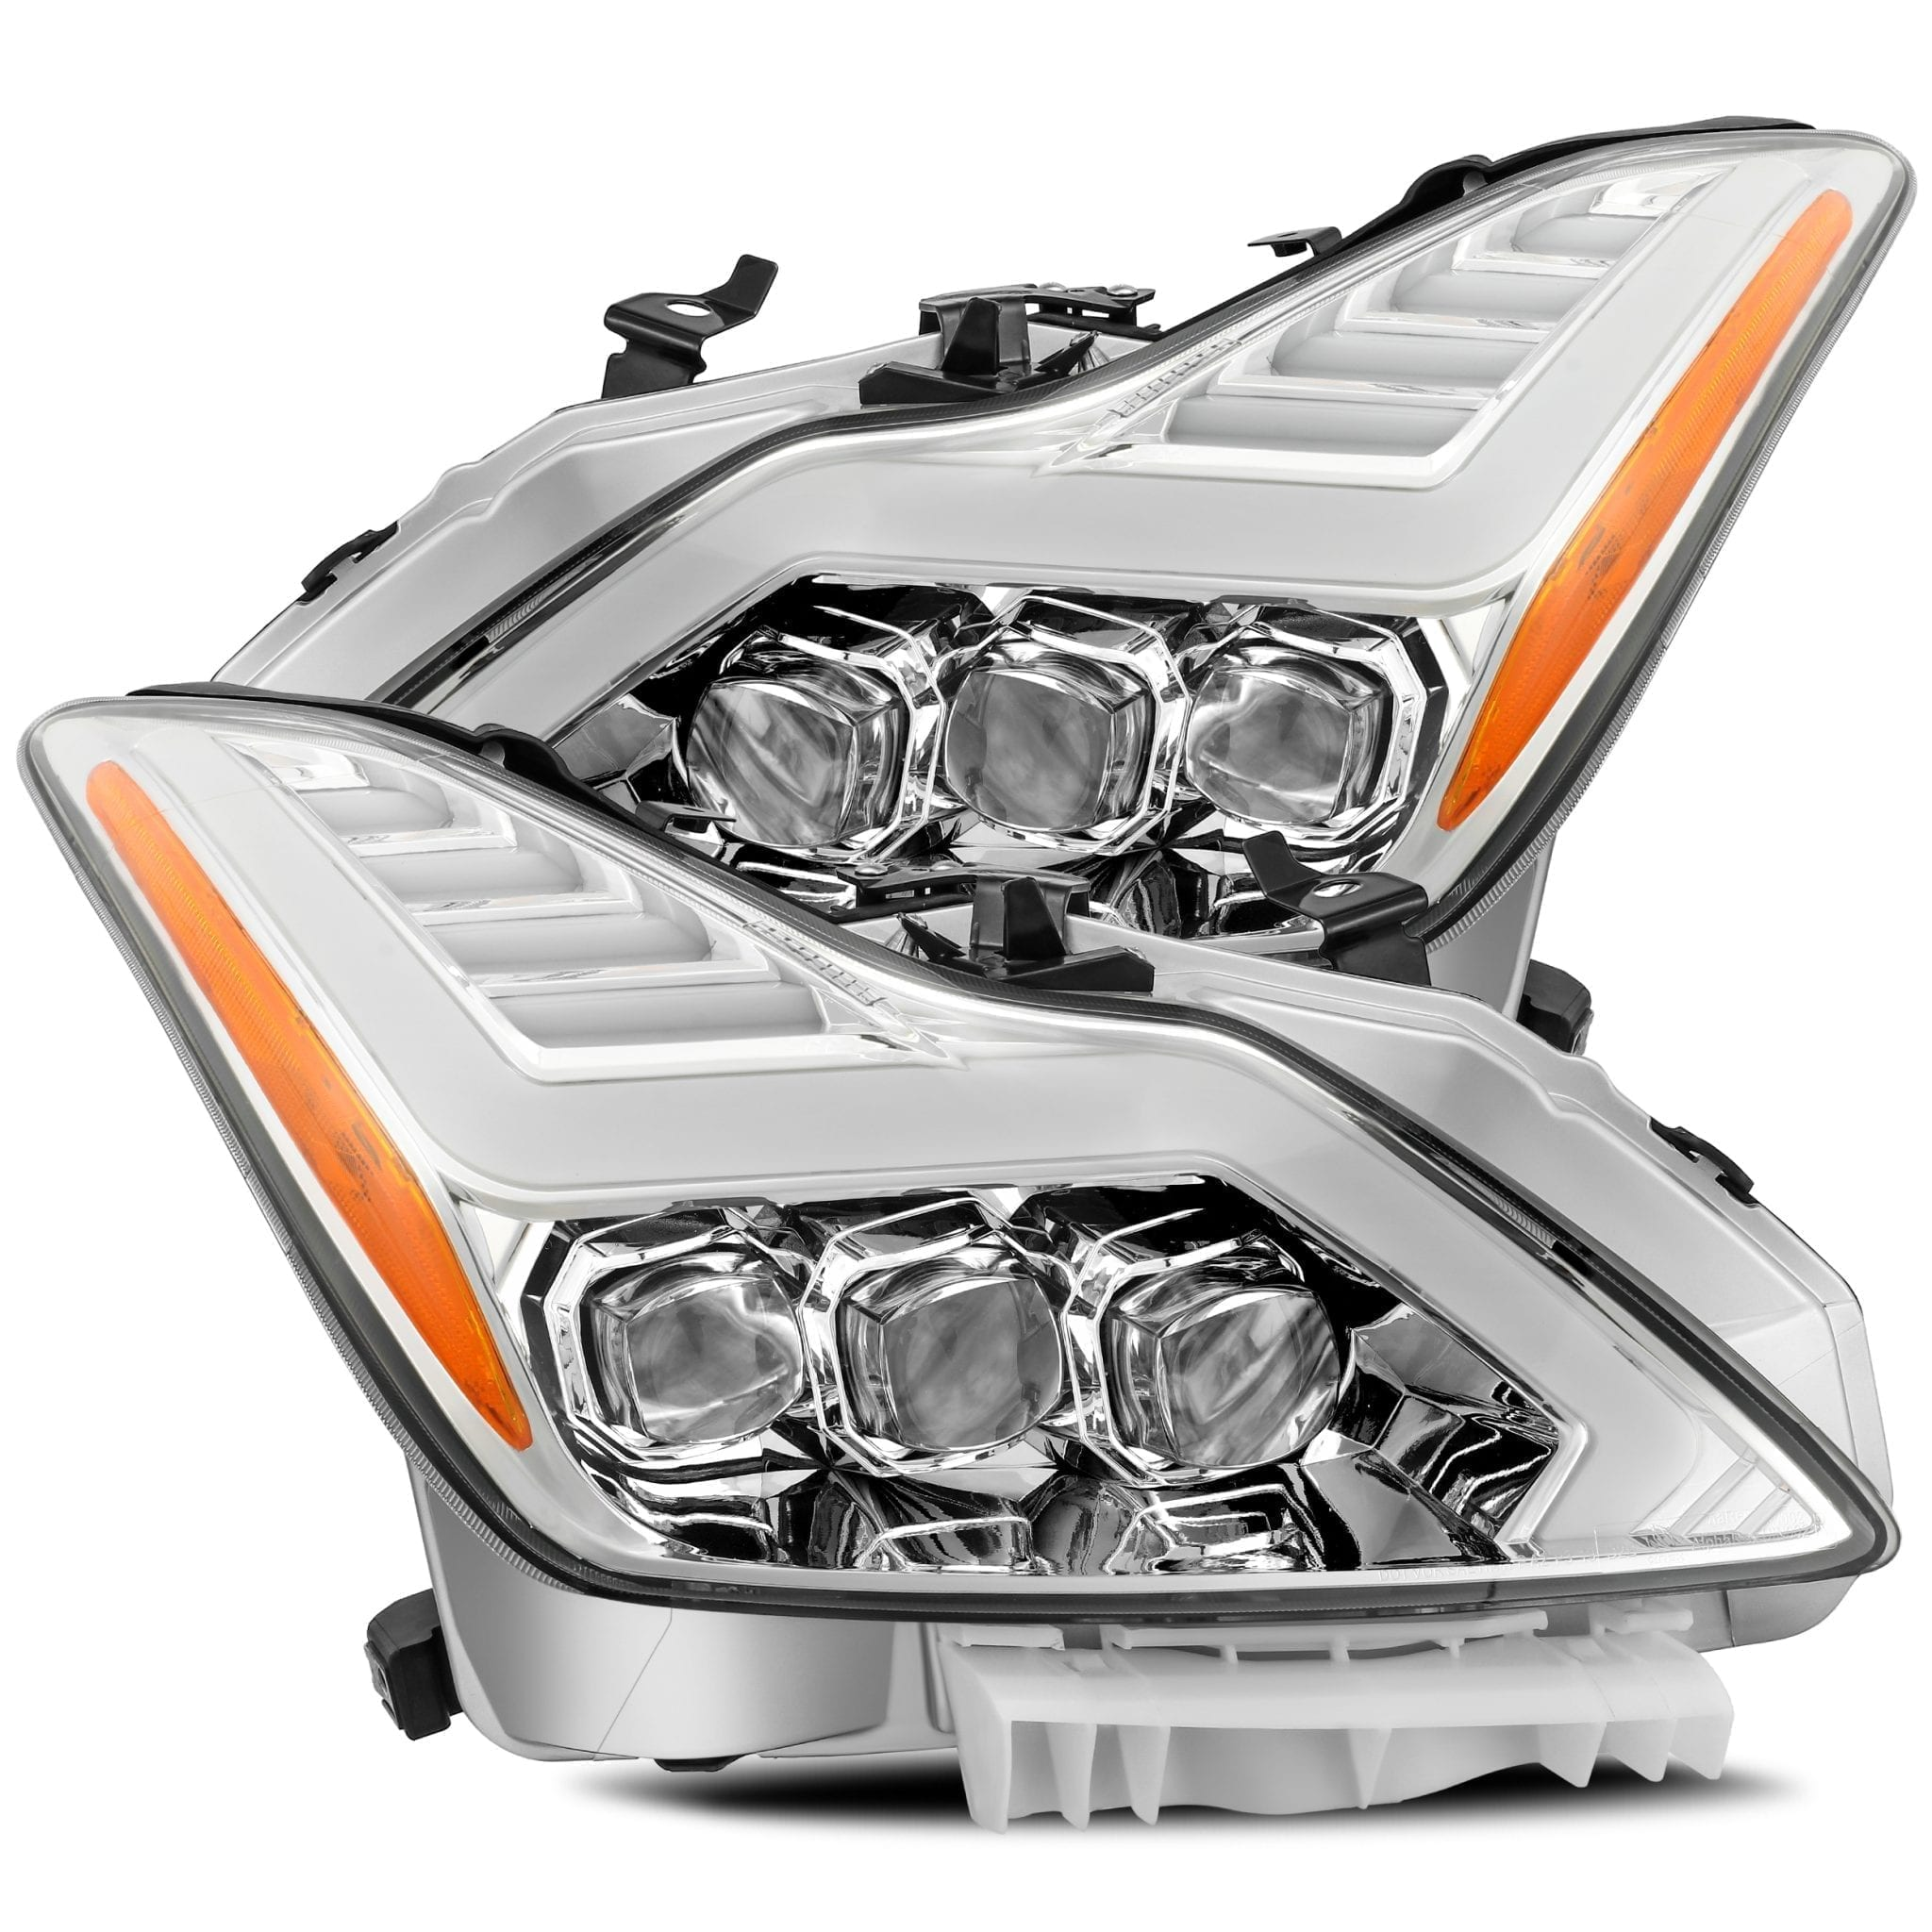 2008 2009 2010 2011 2012 2013 2014 2015 Infiniti G37 Q60 NOVA-Series Full LED Projector Headlights Chrome